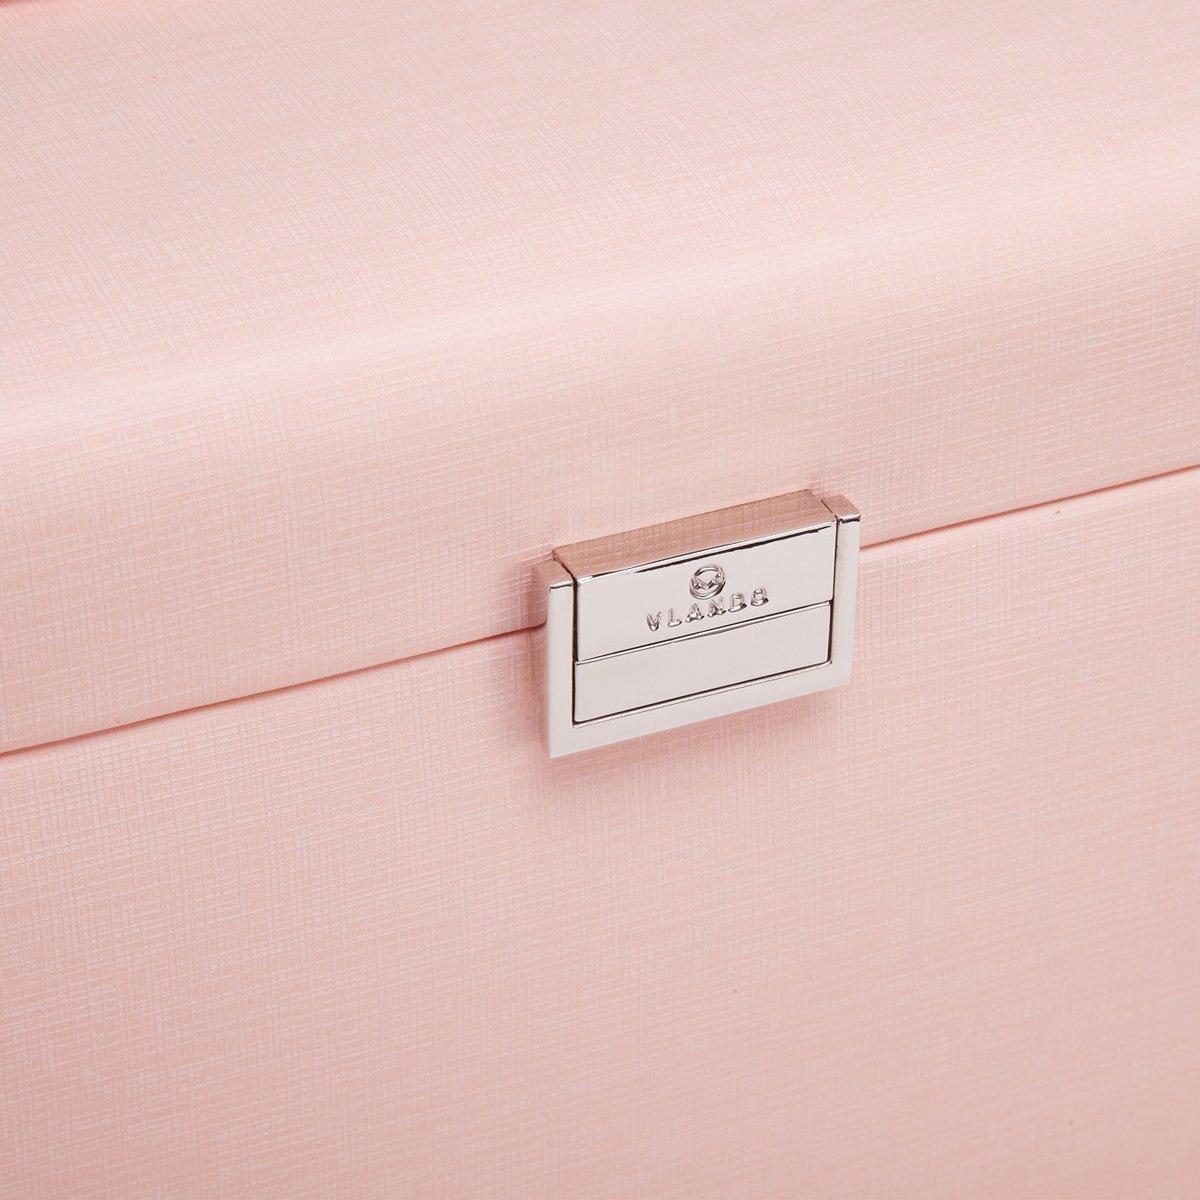 Vlando Jewelry Box, Faux Leather Medium Jewelry Organizer, Vintage gift for Women -Pink-Cross Pattern by Vlando (Image #10)